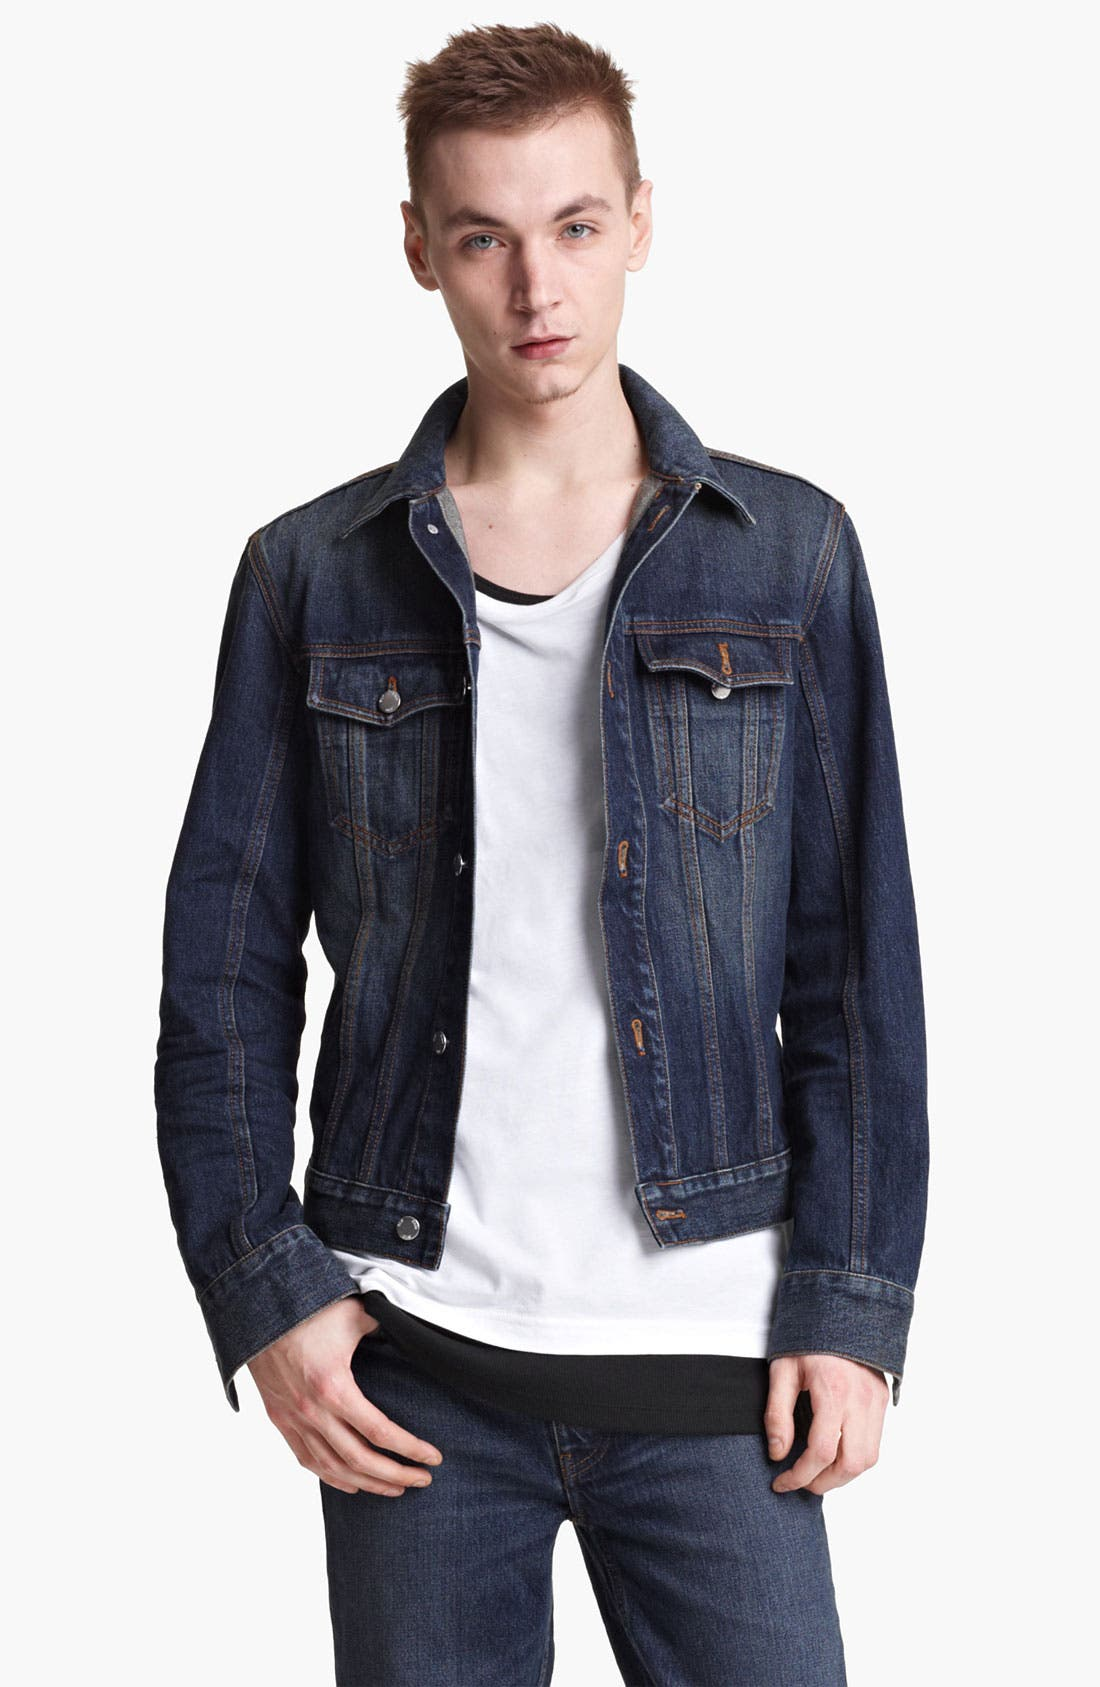 Alternate Image 1 Selected - BLK DNM 'Jeans Jacket 5' Stonewashed Denim Jacket